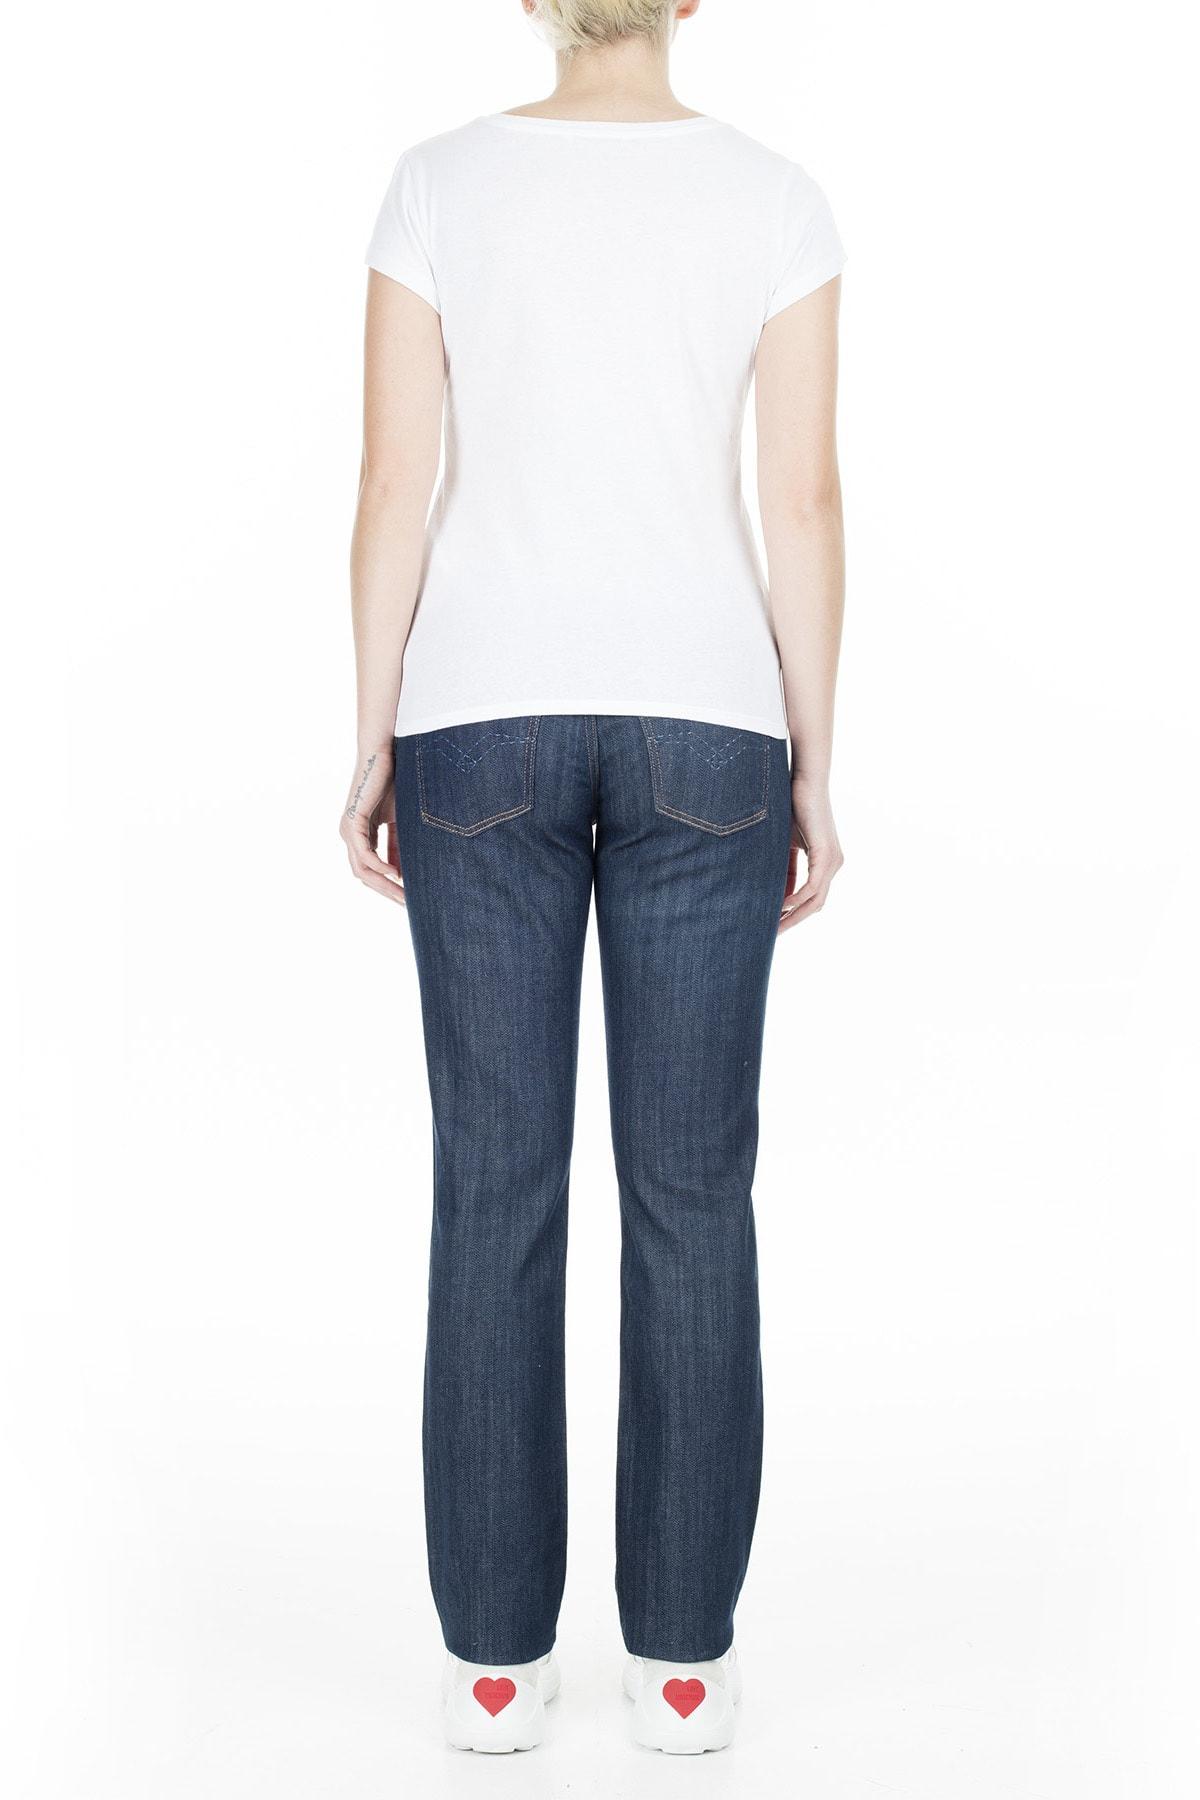 Replay Jeans Kadın Kot Pantolon Zoxwv591 4